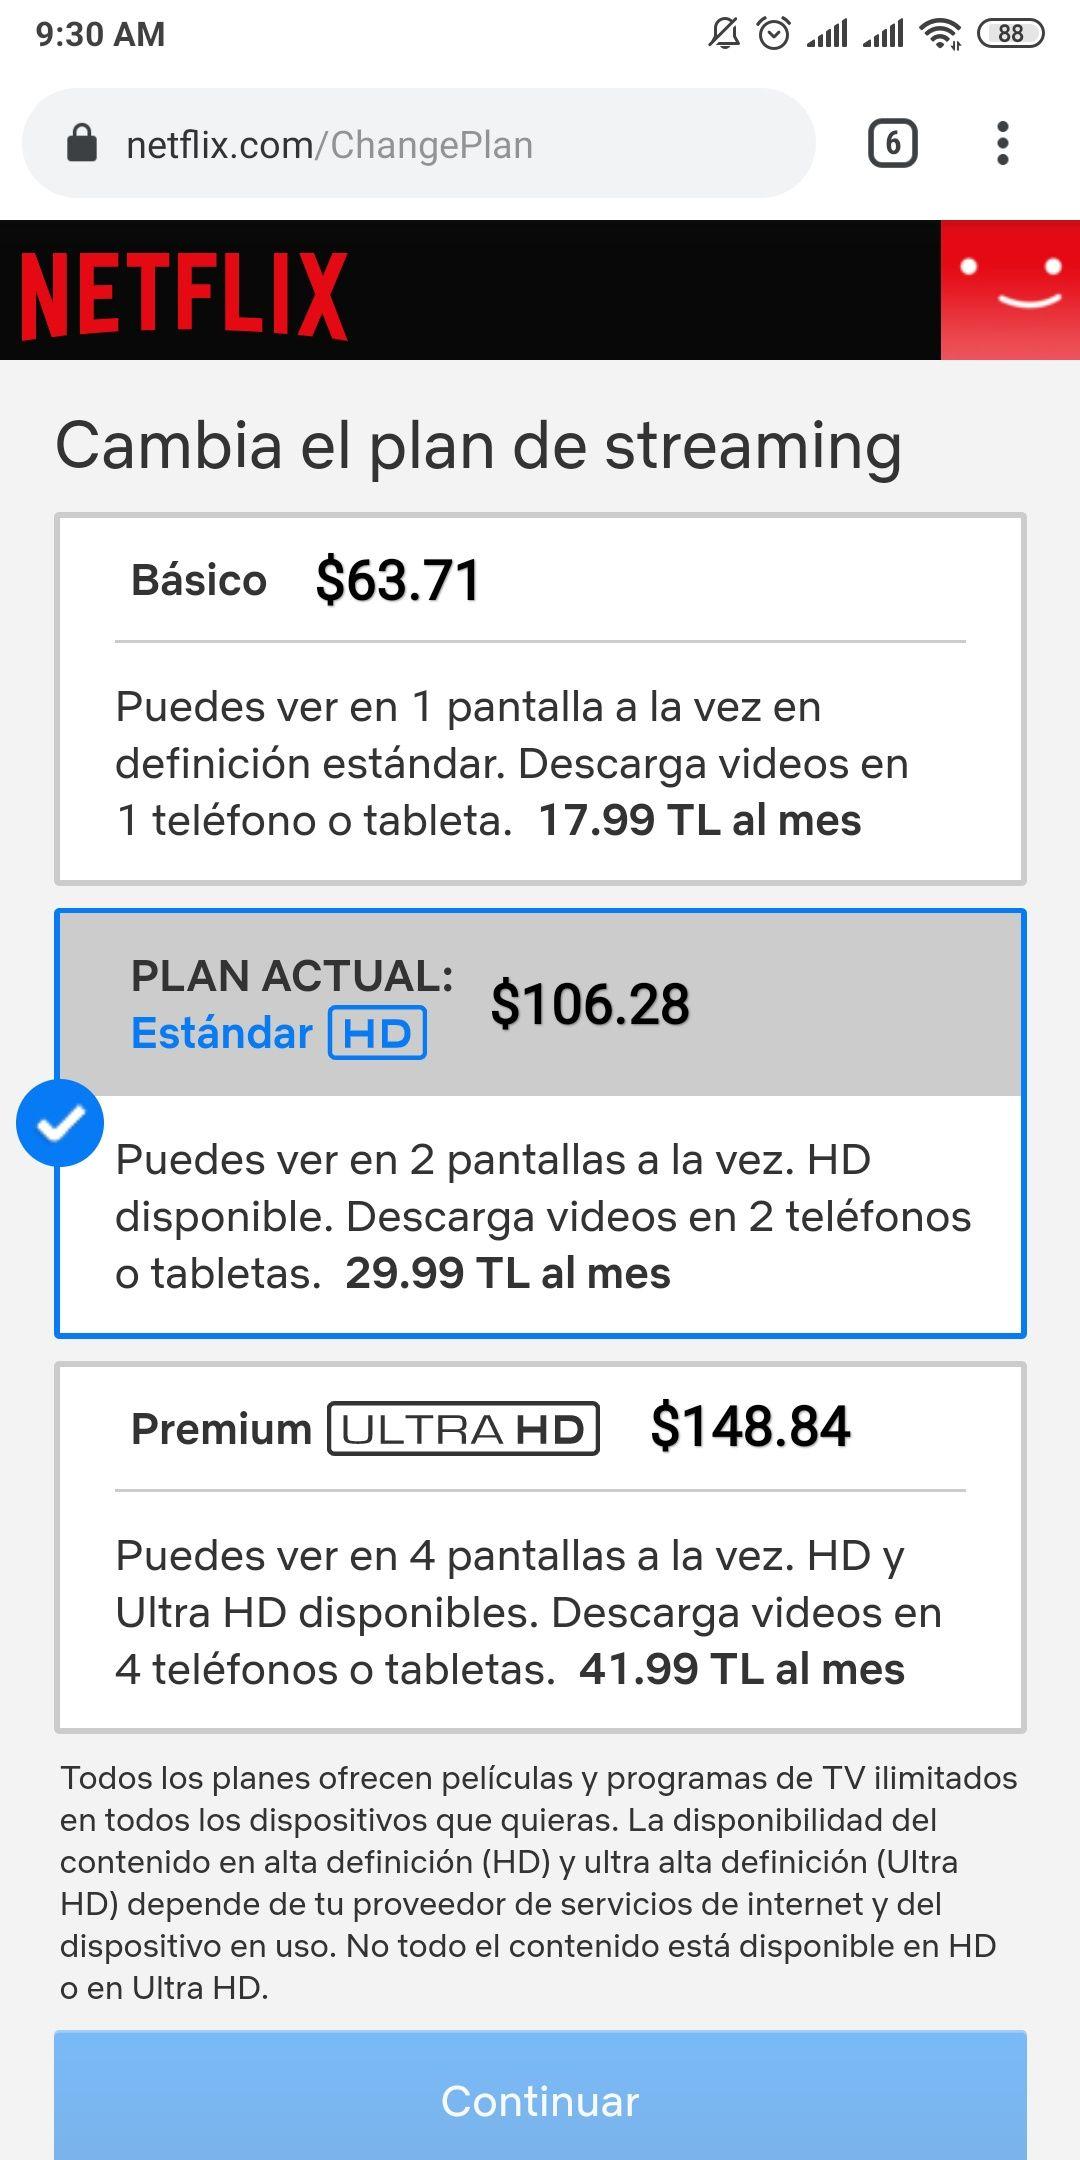 Netflix Turquia 2.0 (Plan 4K= $148) + TUTORIAL CON IMAGENES